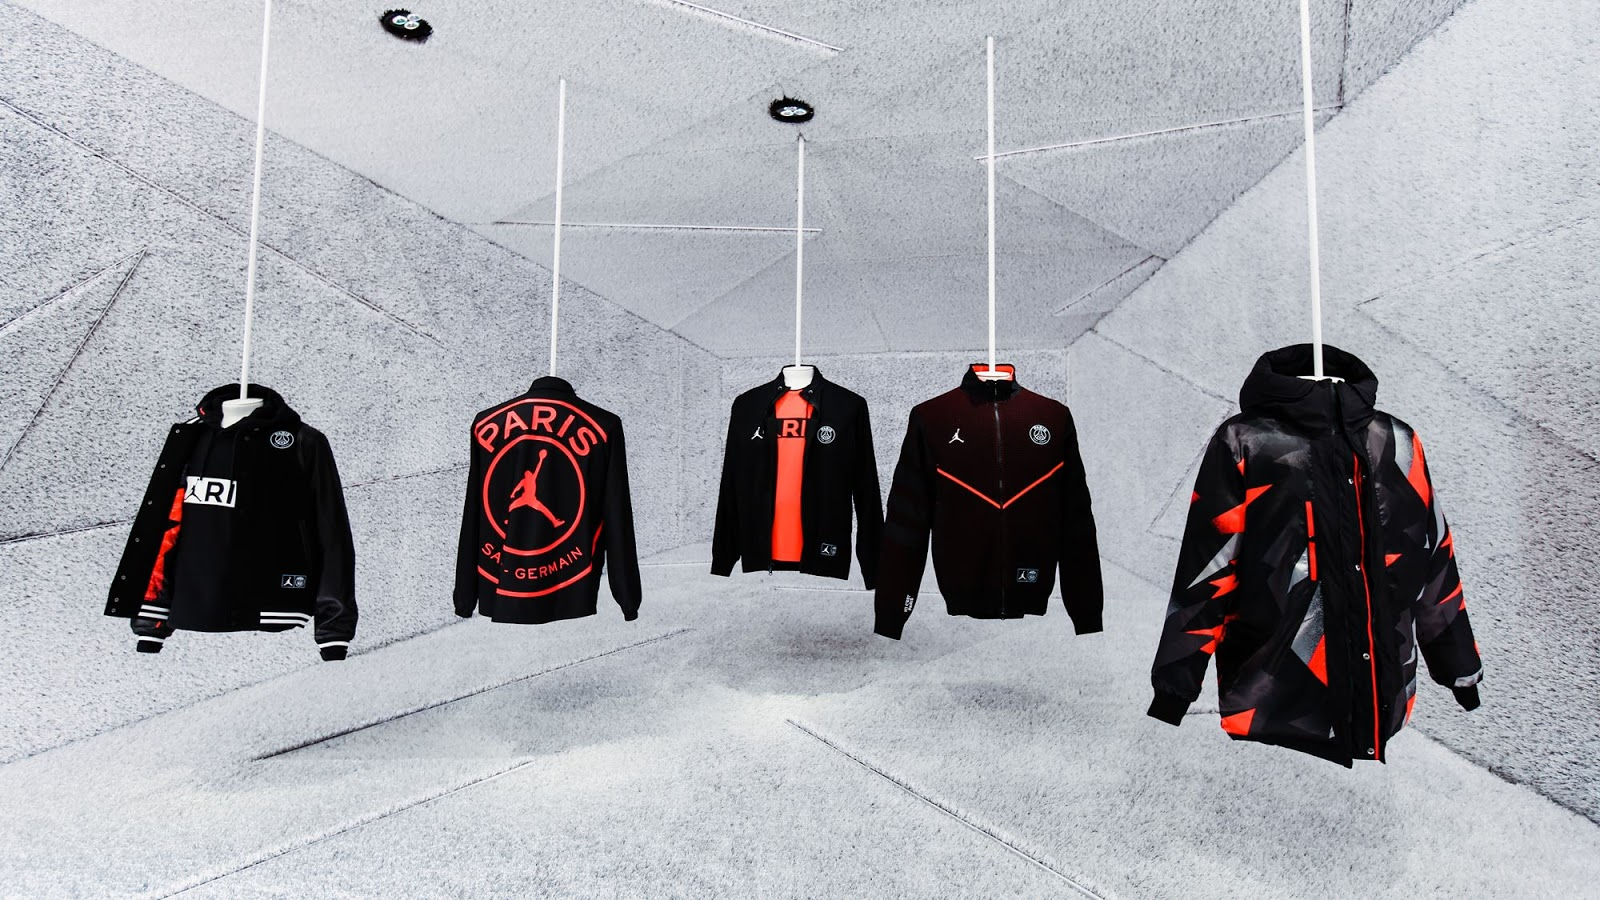 kit coming very soon jordan x psg 19